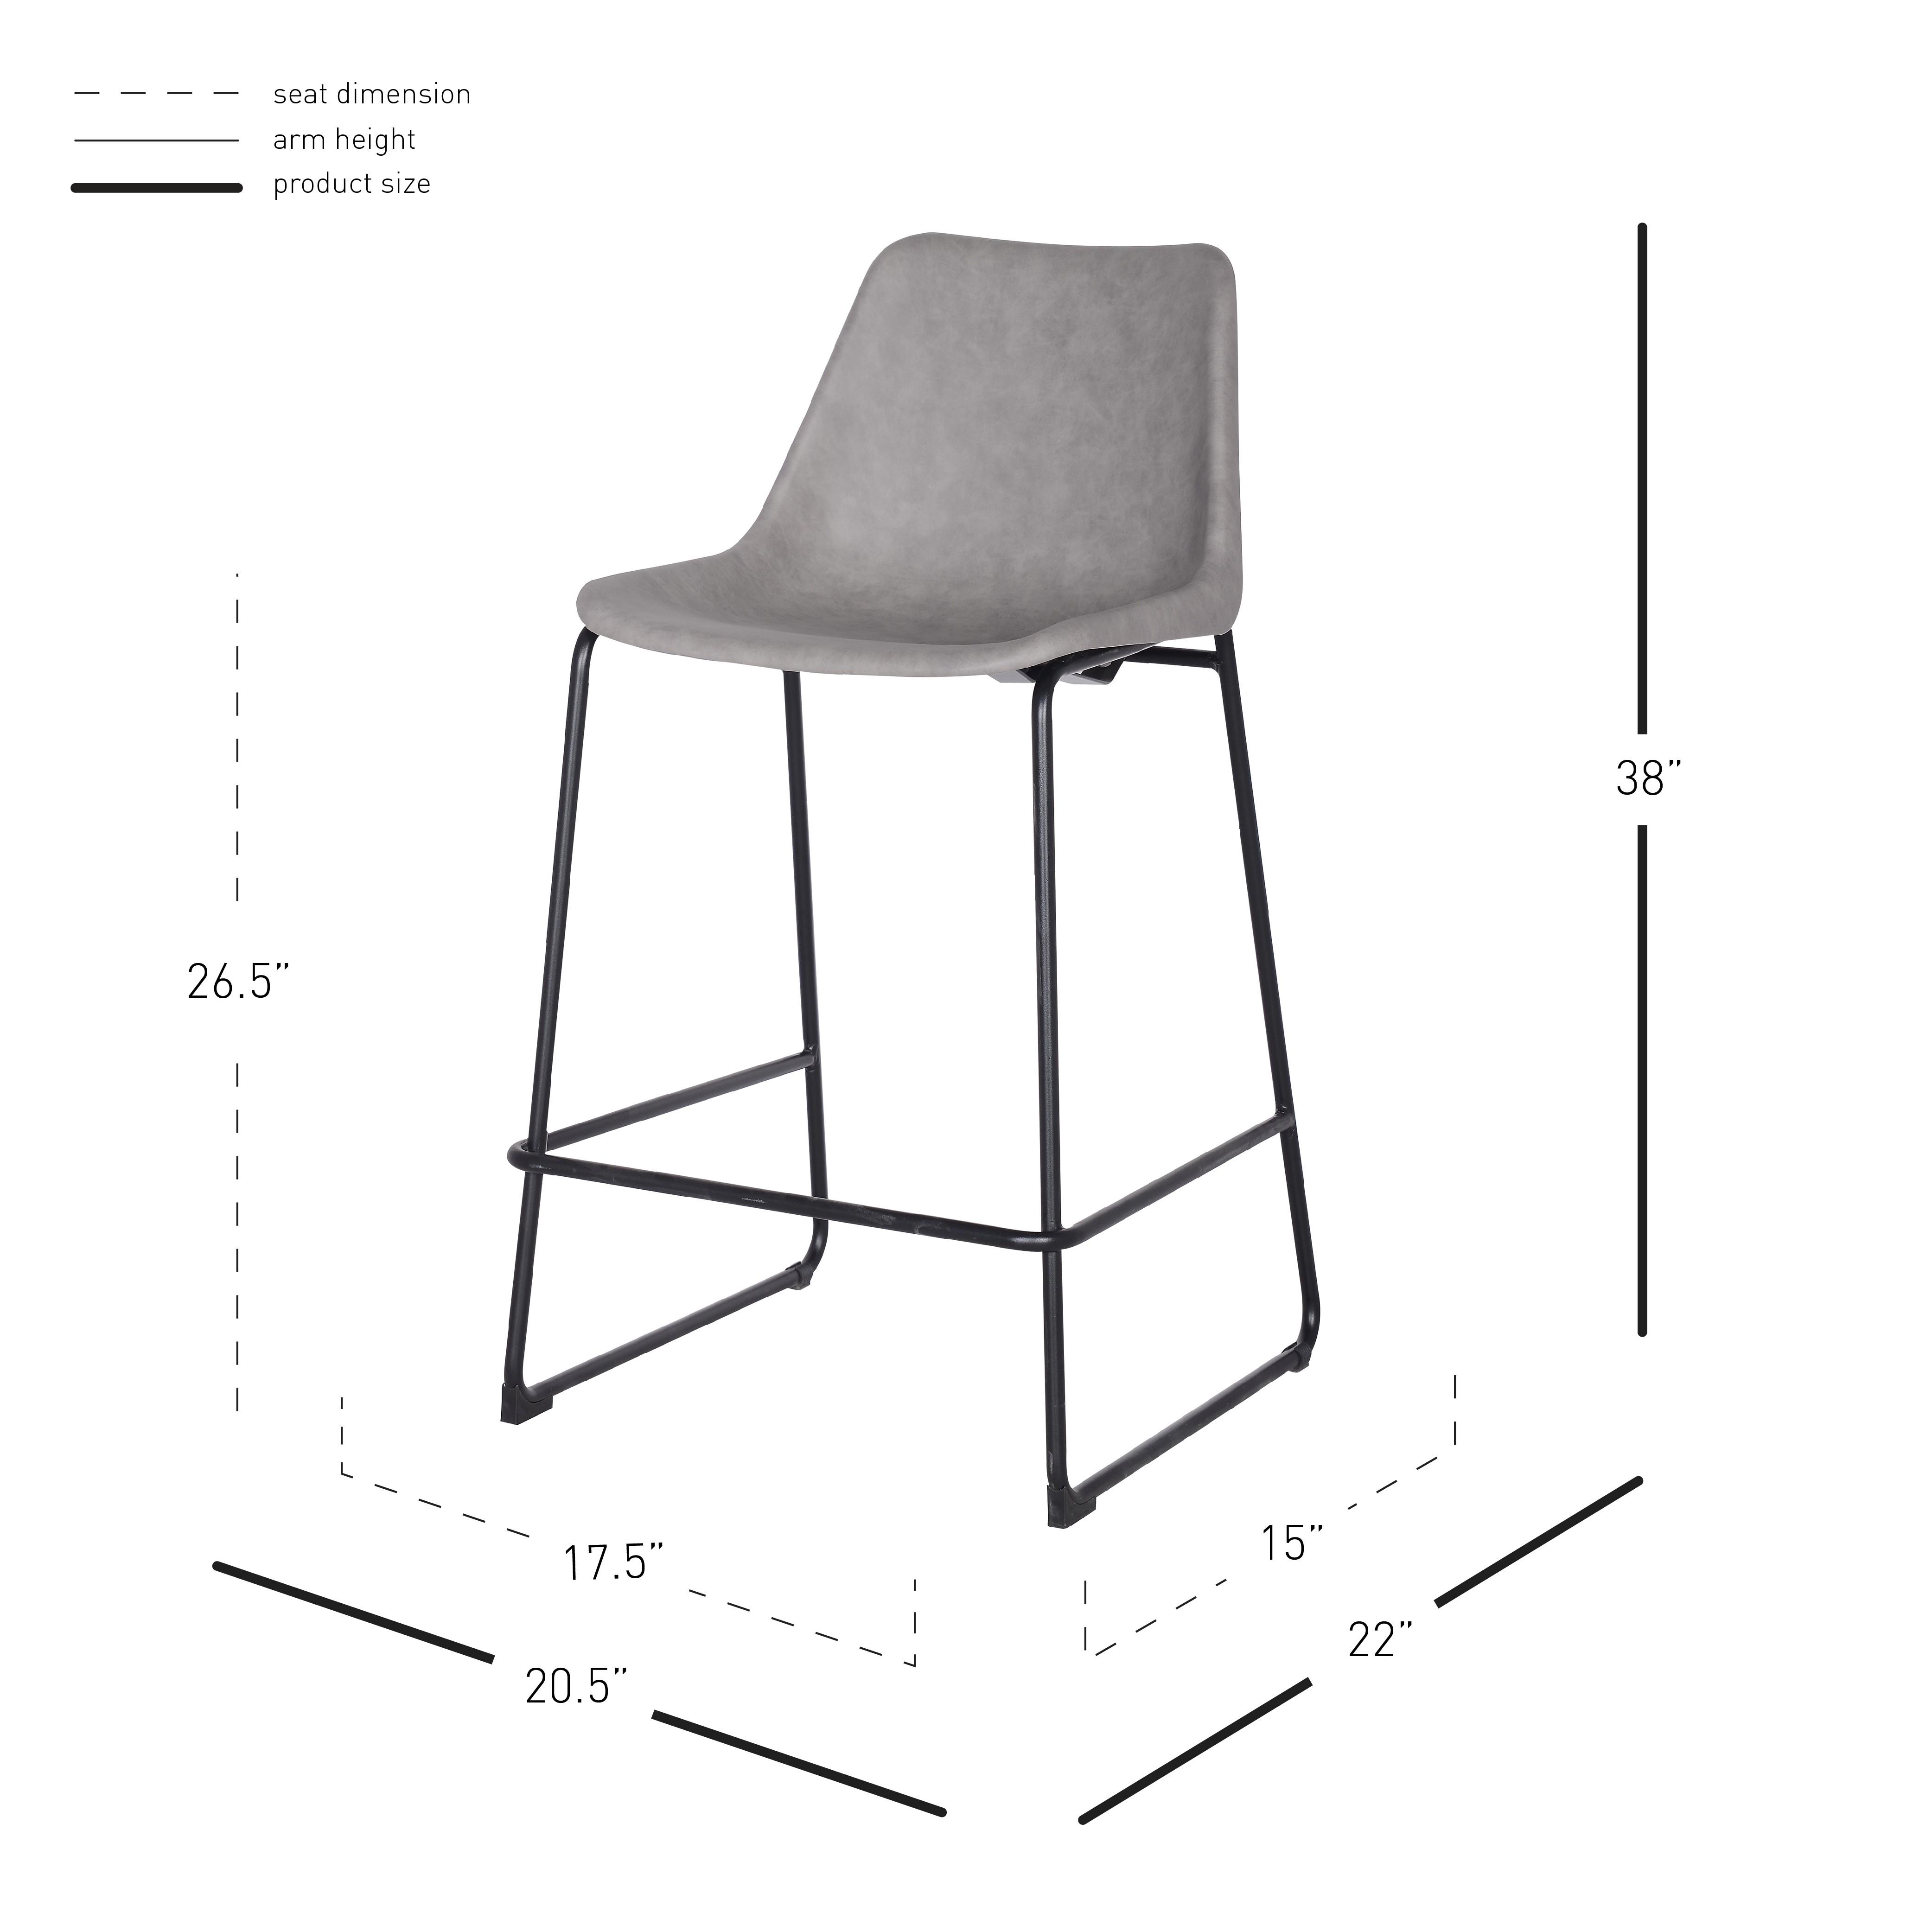 9300022 239 Npd Home Furniture Wholesale Lifestyle Furnishings